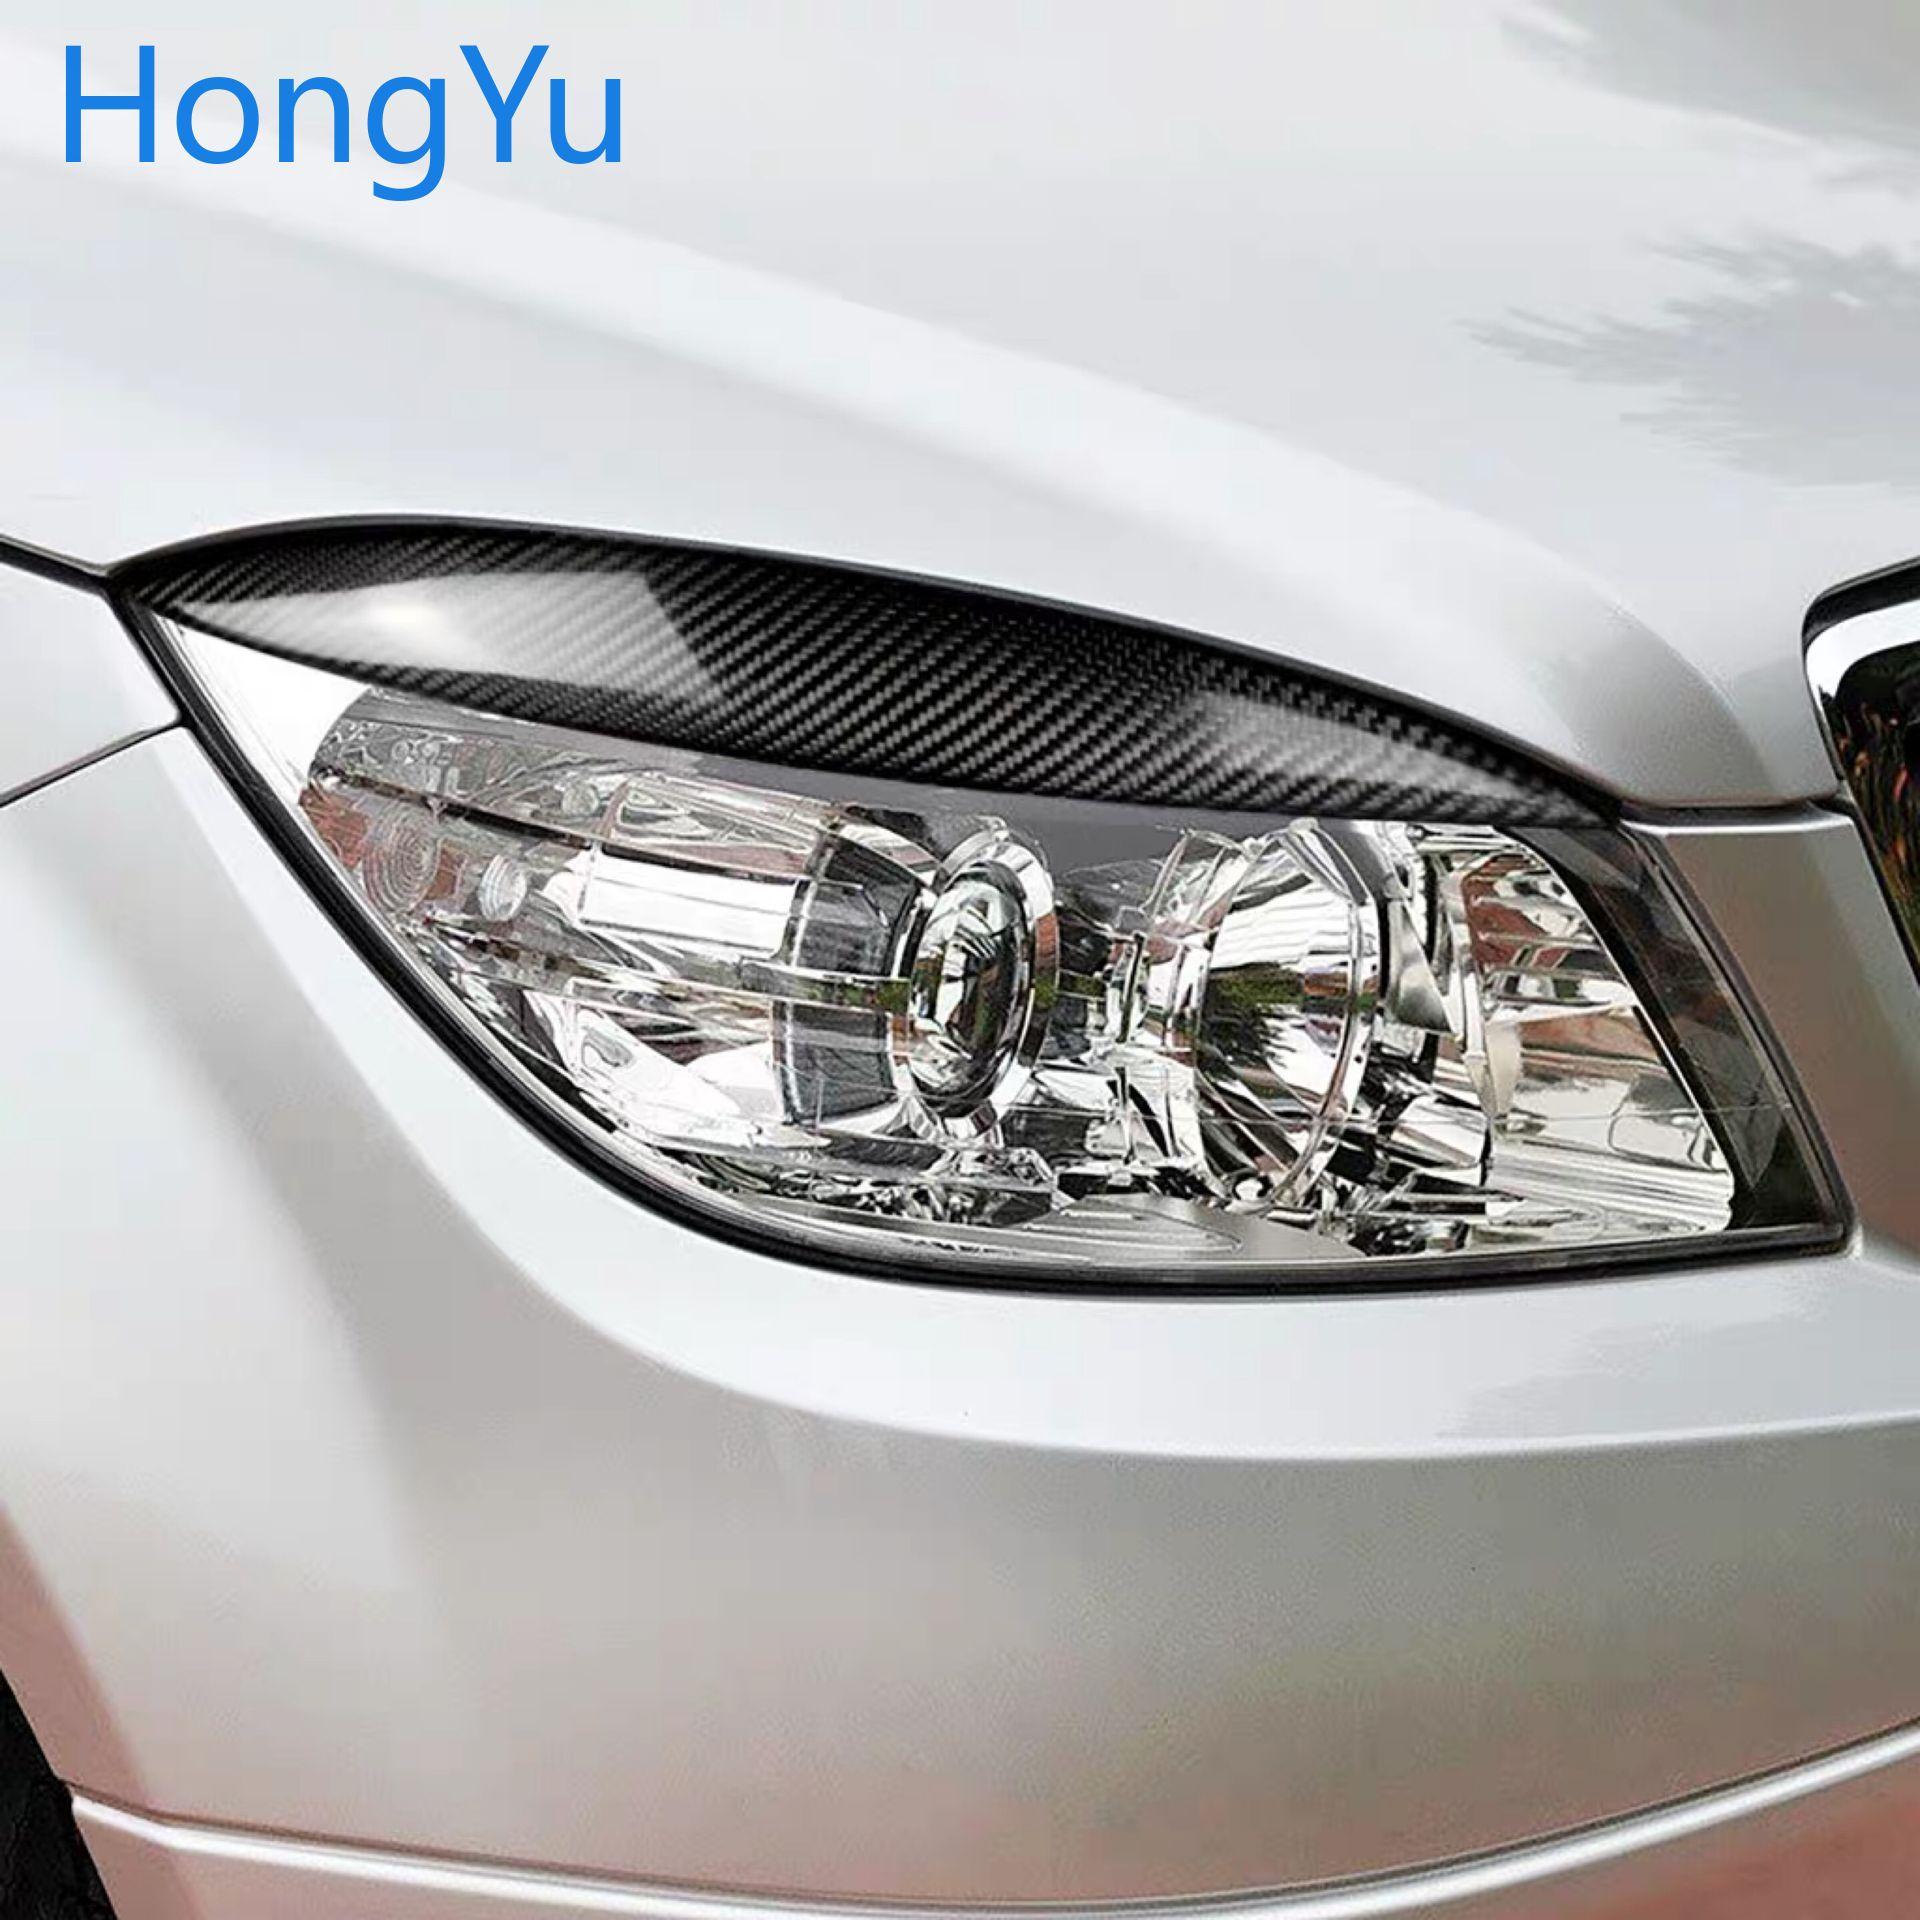 Real Carbon Fiber Car Front Headlight Eyebrows Eyelids For Mercedes For Mercedes Benz W204 C180 C200 C300 C350 C63 2008-2011